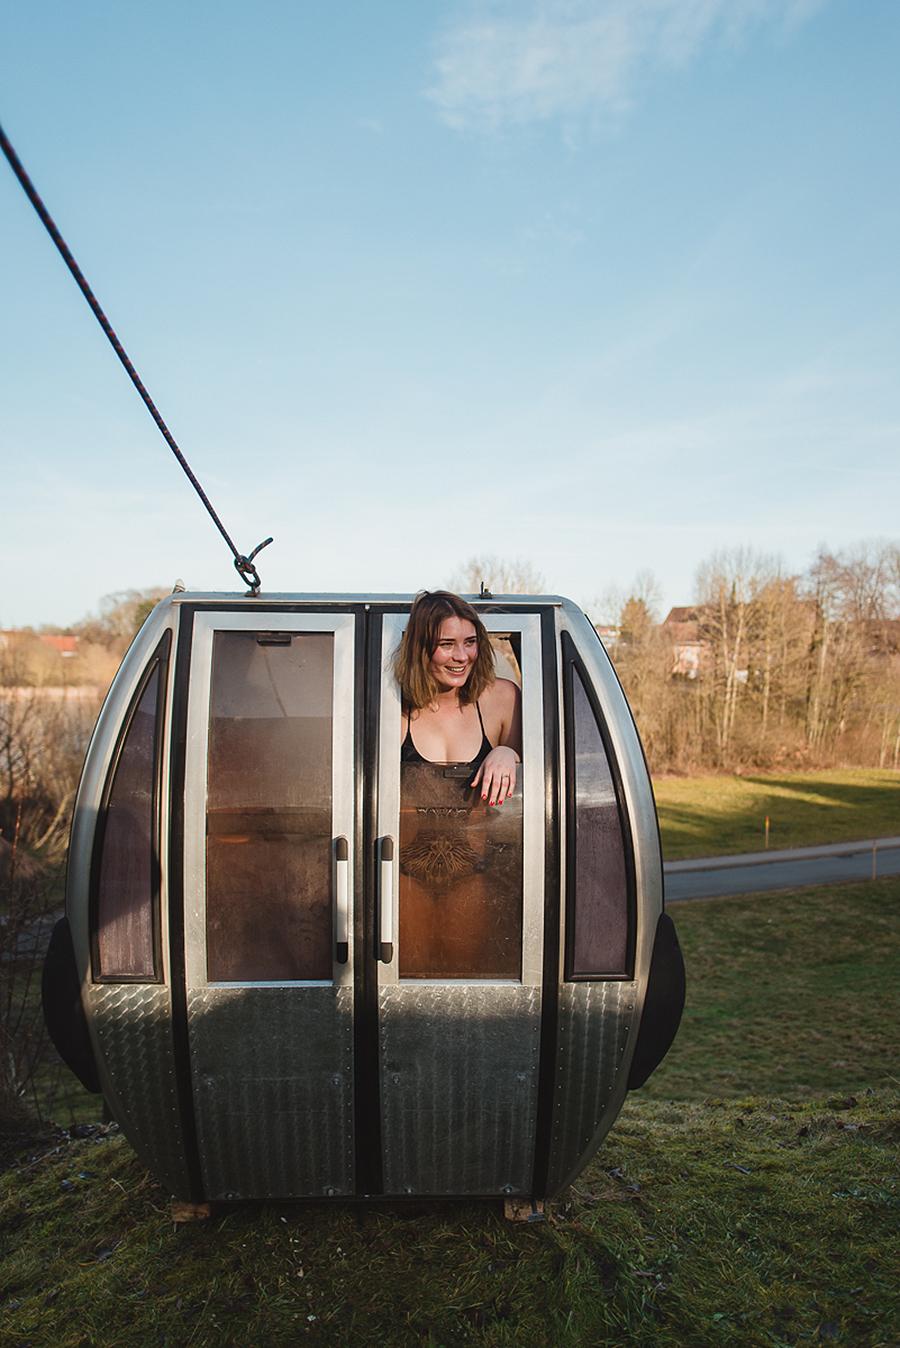 The Saunagondel